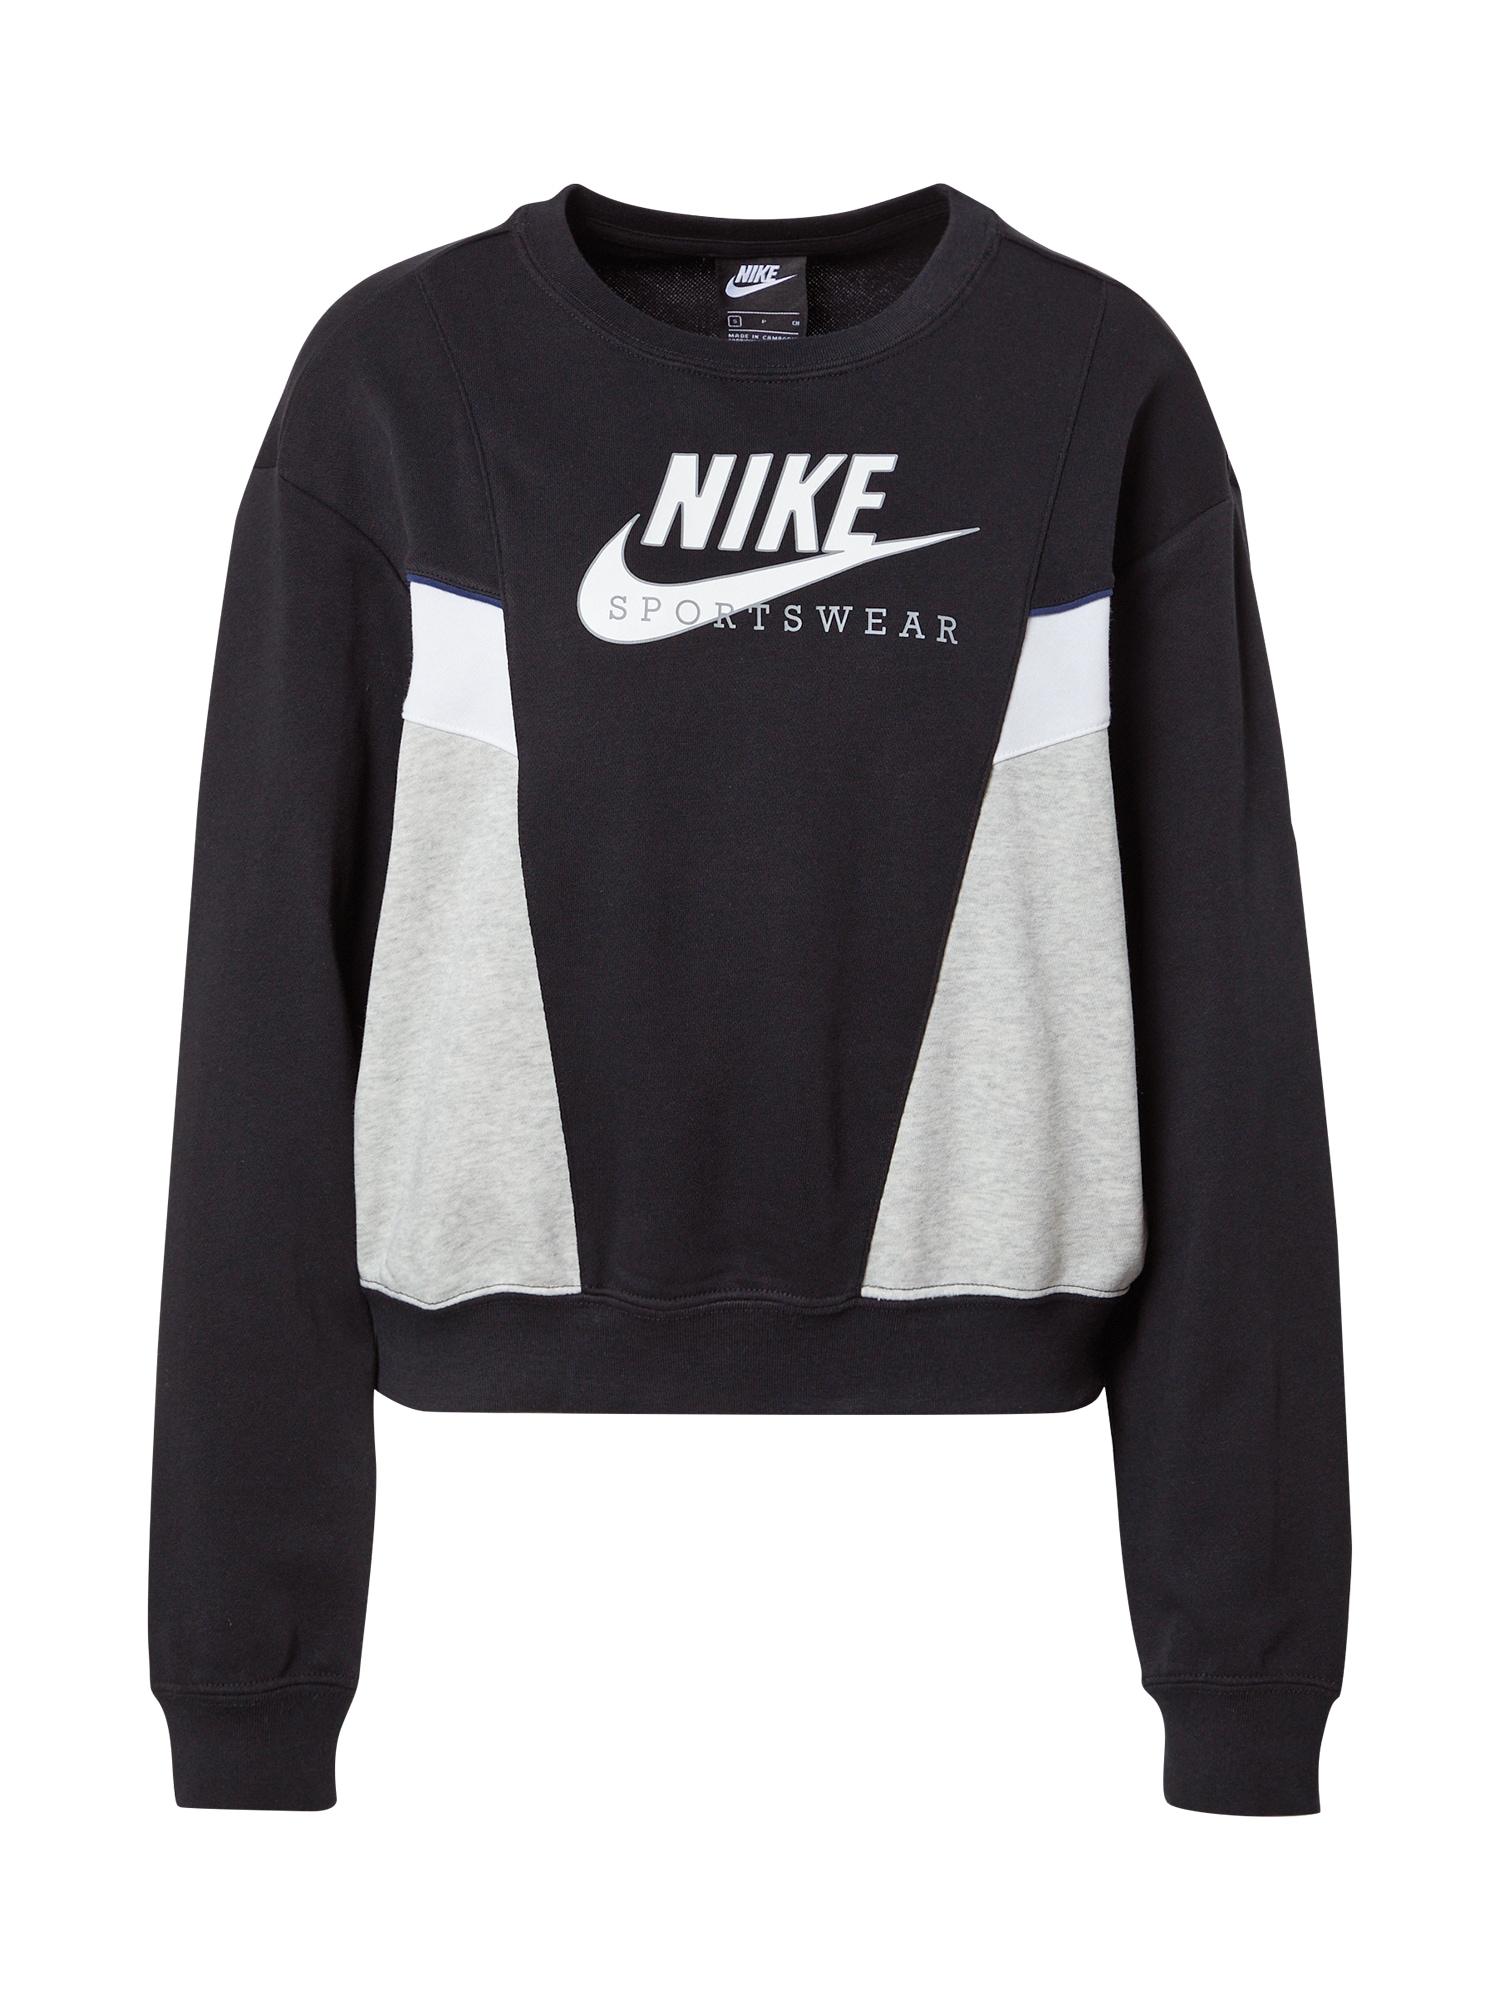 Nike Sportswear Megztinis be užsegimo 'Heritage' juoda / balta / pilka / mėlyna